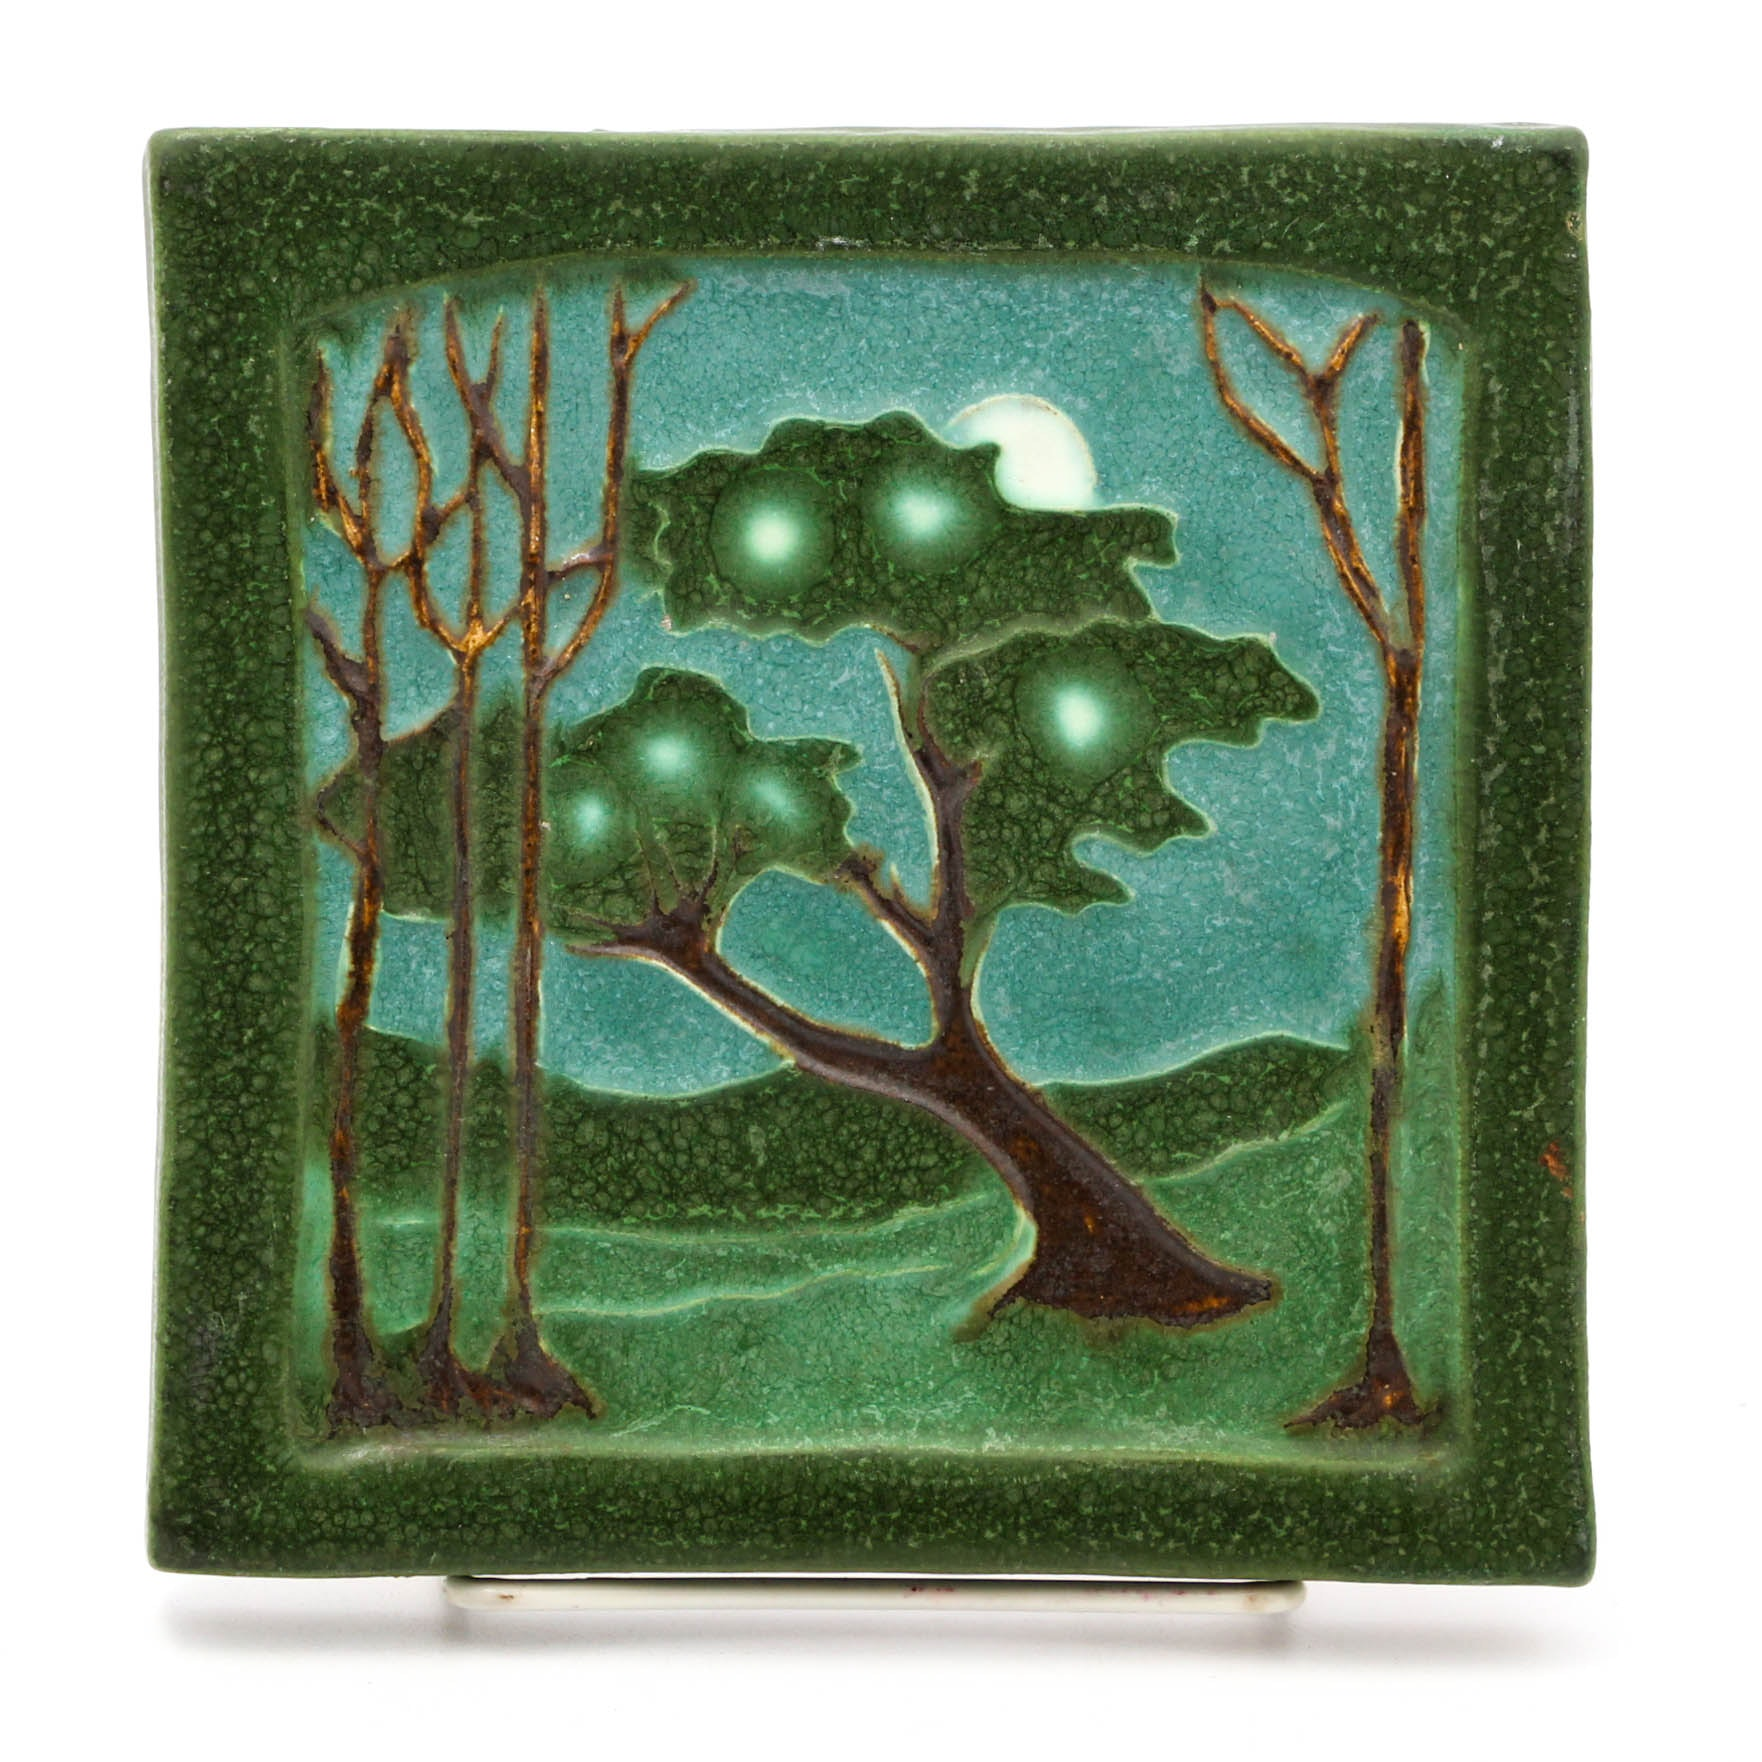 Ephraim Pottery Tile of a Nocturnal Landscape